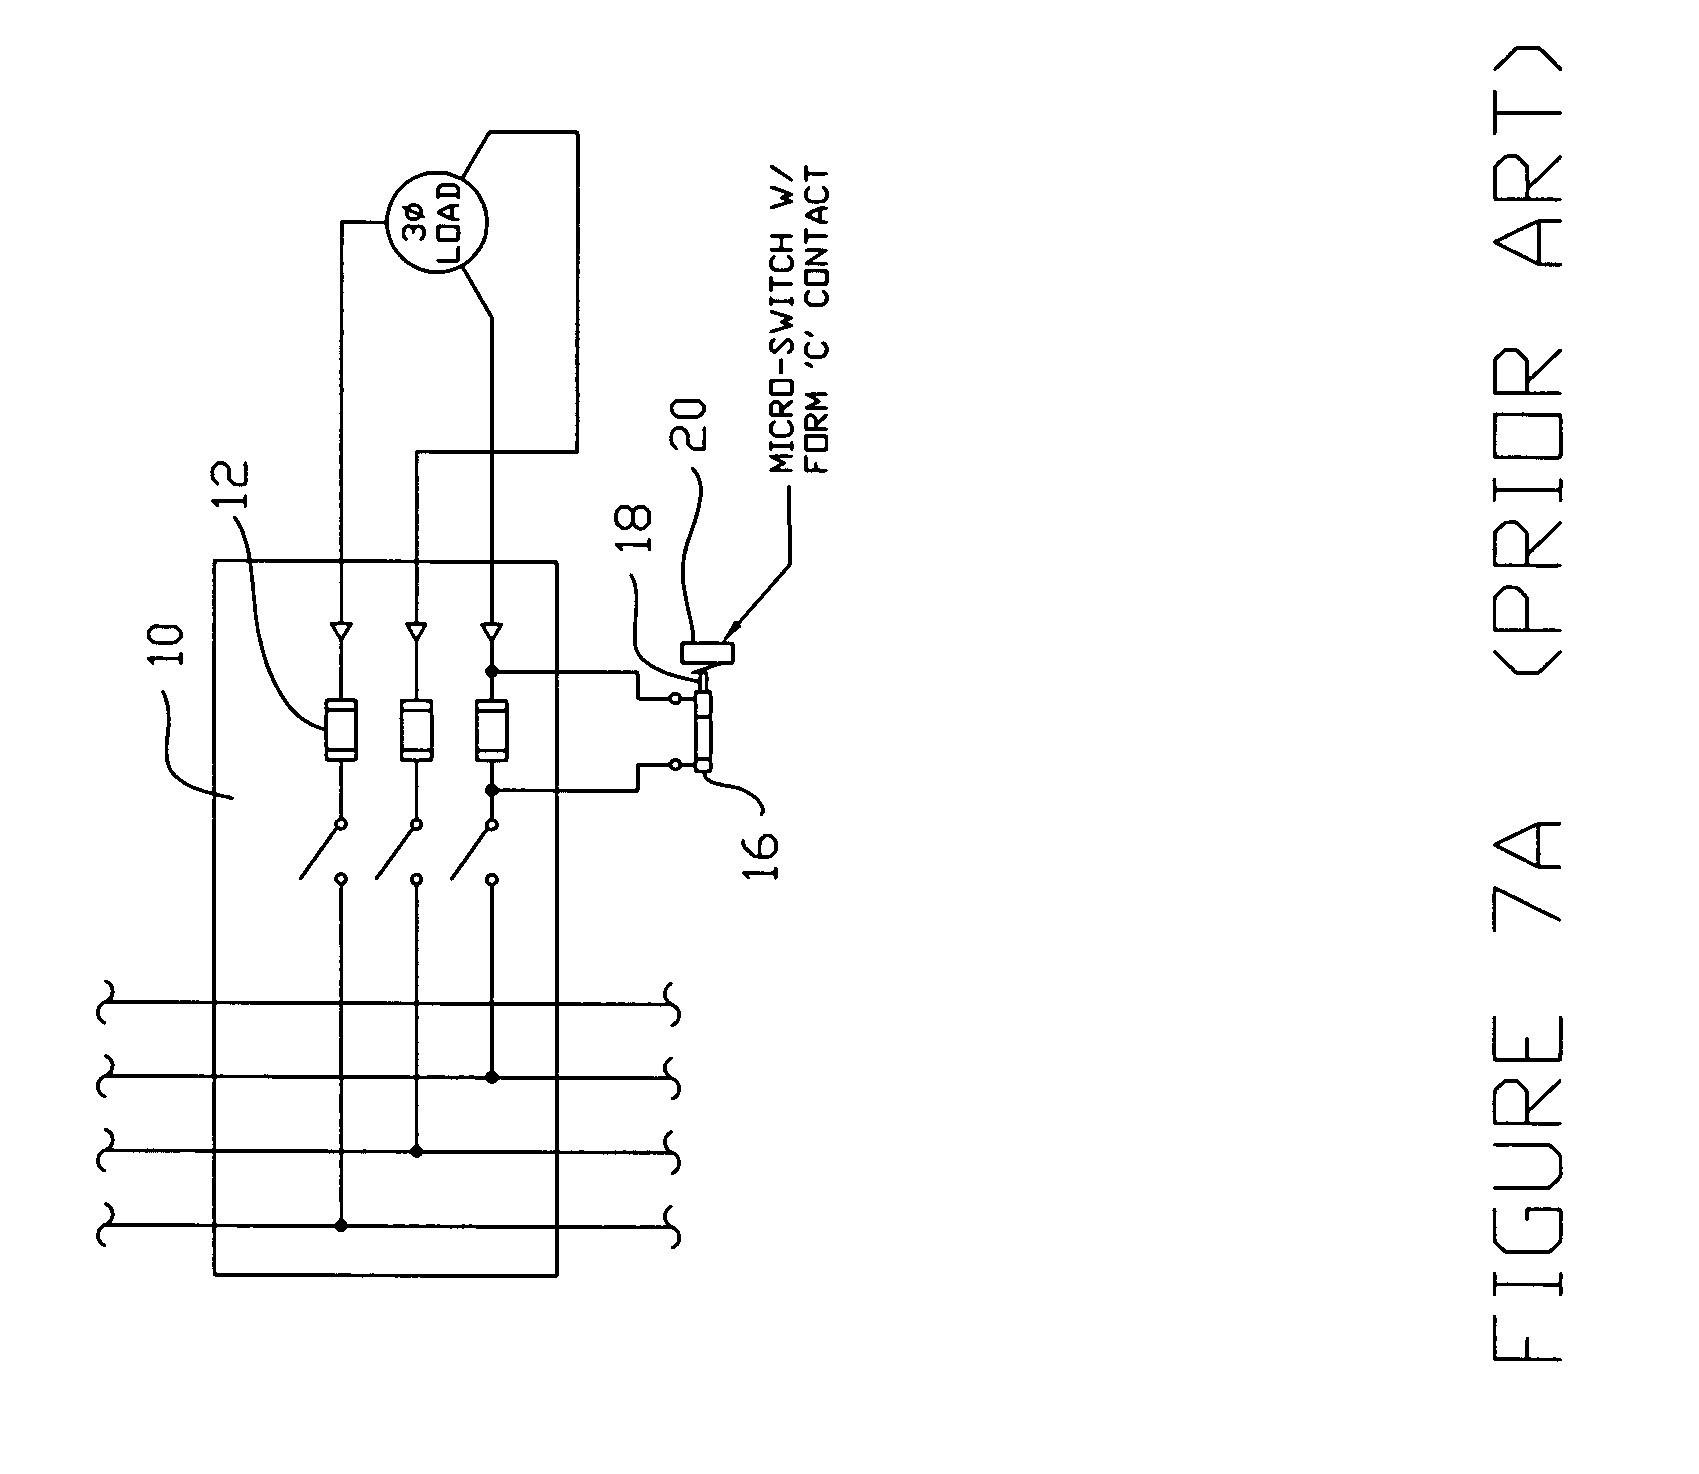 Cutler Hammer Motor Starter Wiring Diagram Wiring Diagram At Eaton - Magnetic Starter Wiring Diagram